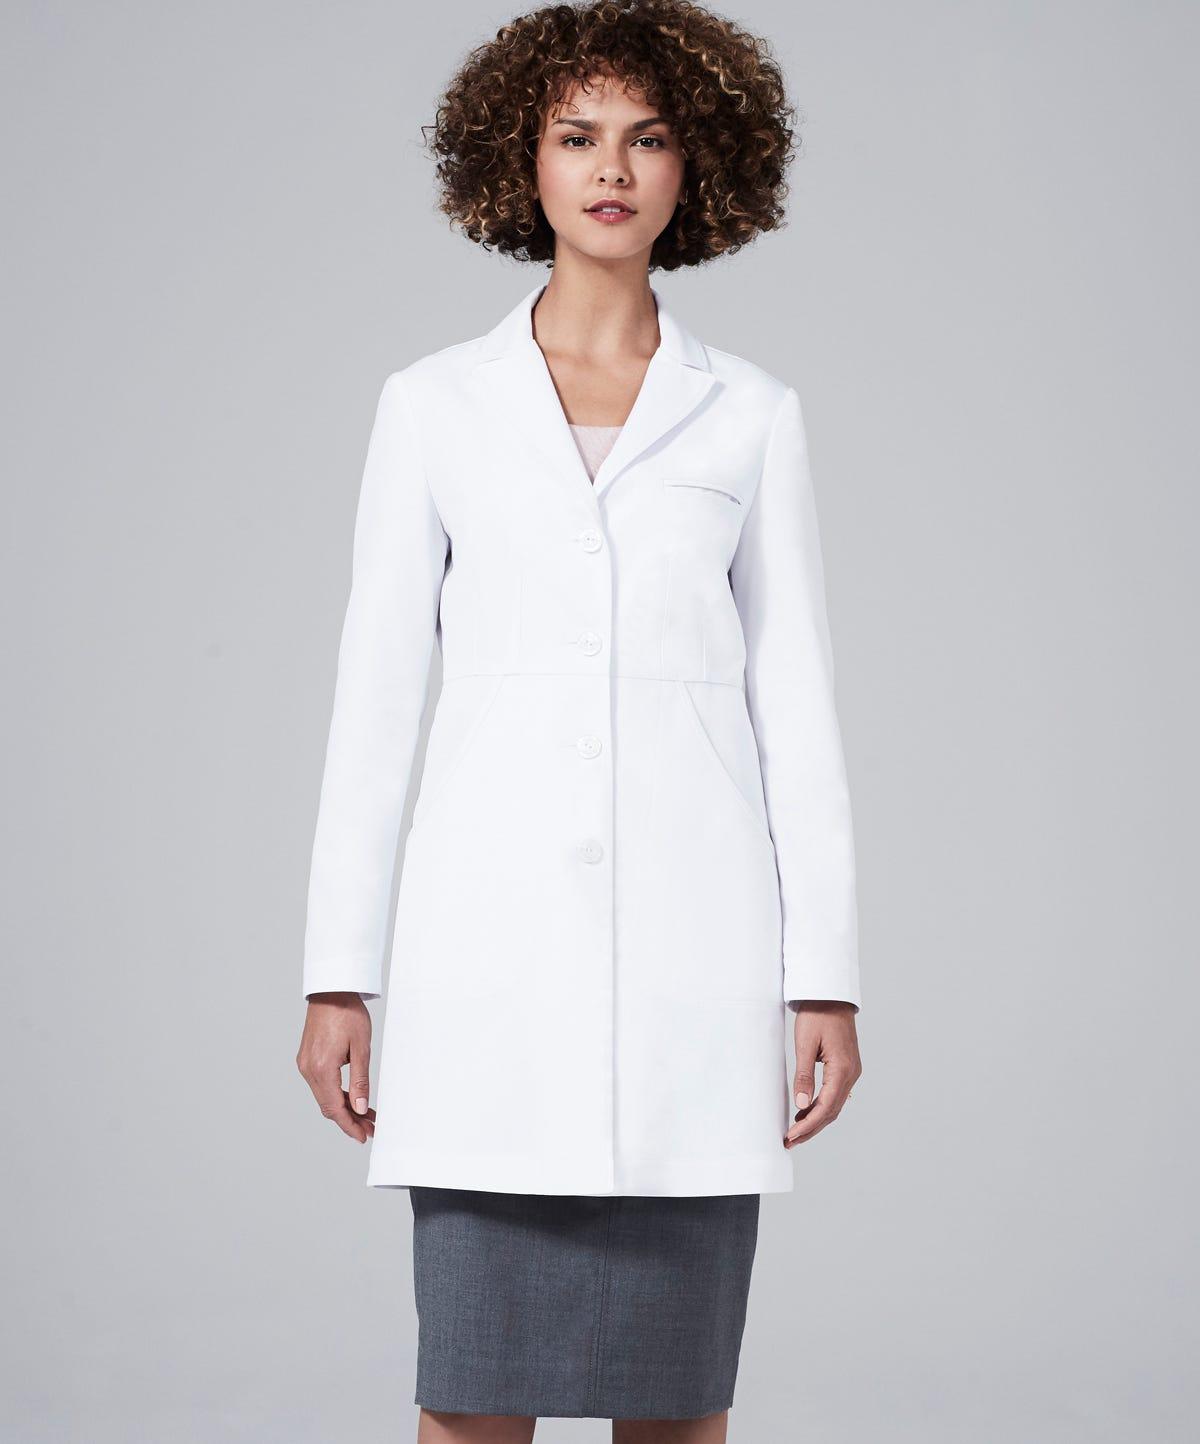 White apron for doctors online - M3 Miranda B Slim Fit Lab Coat